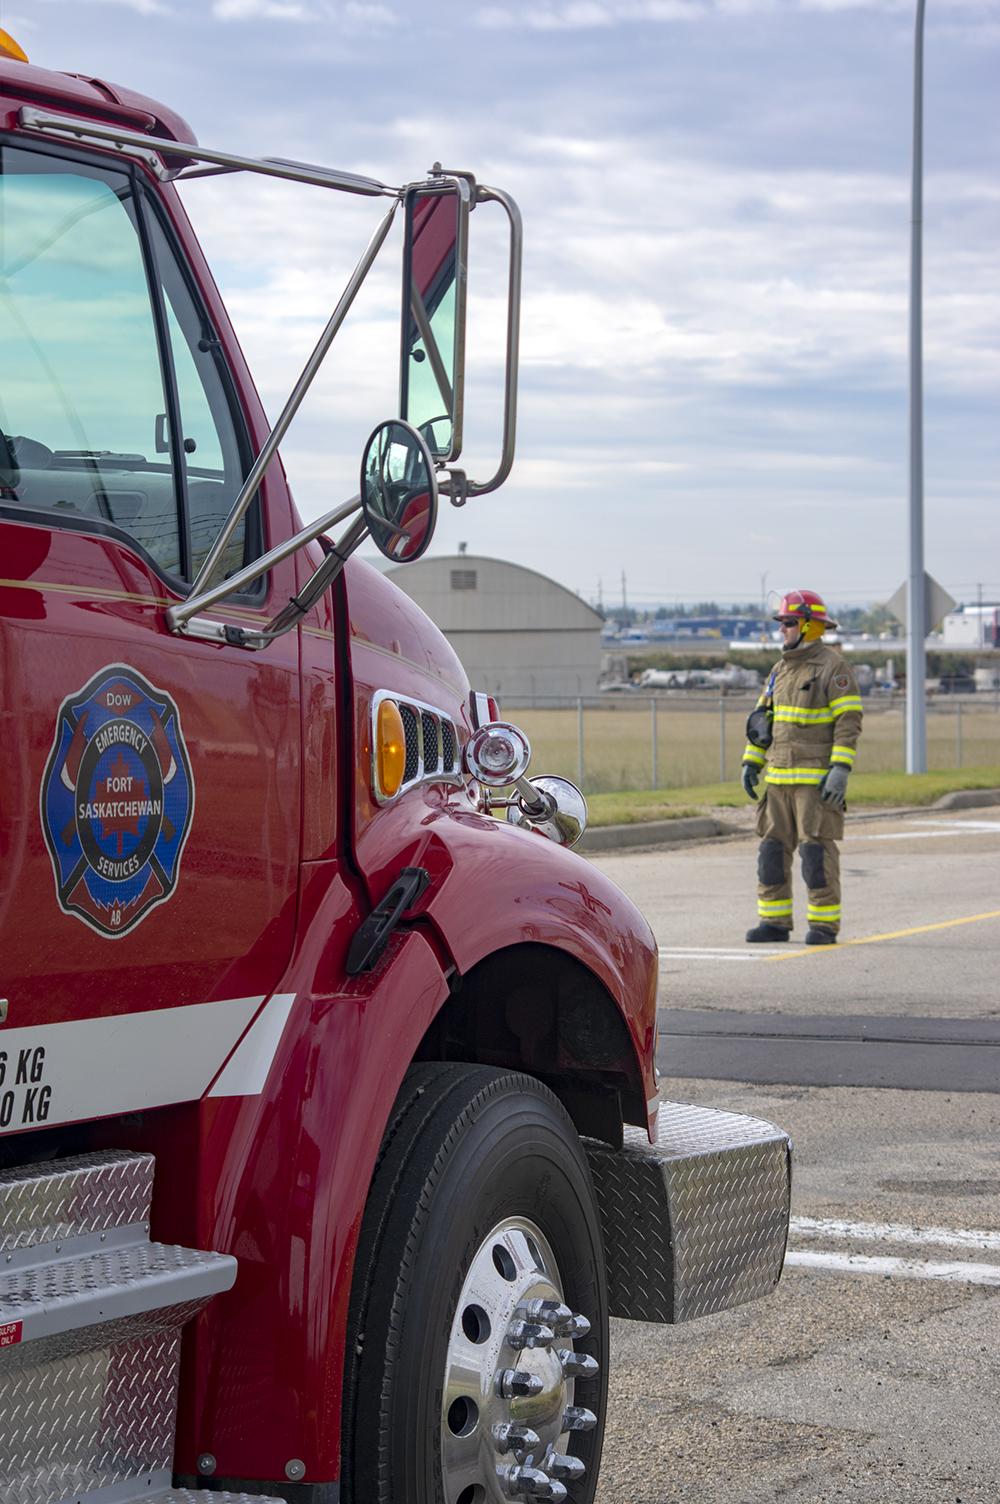 ADJ - DOW Firetruck and Fireman - Medium _IMG1748.jpg